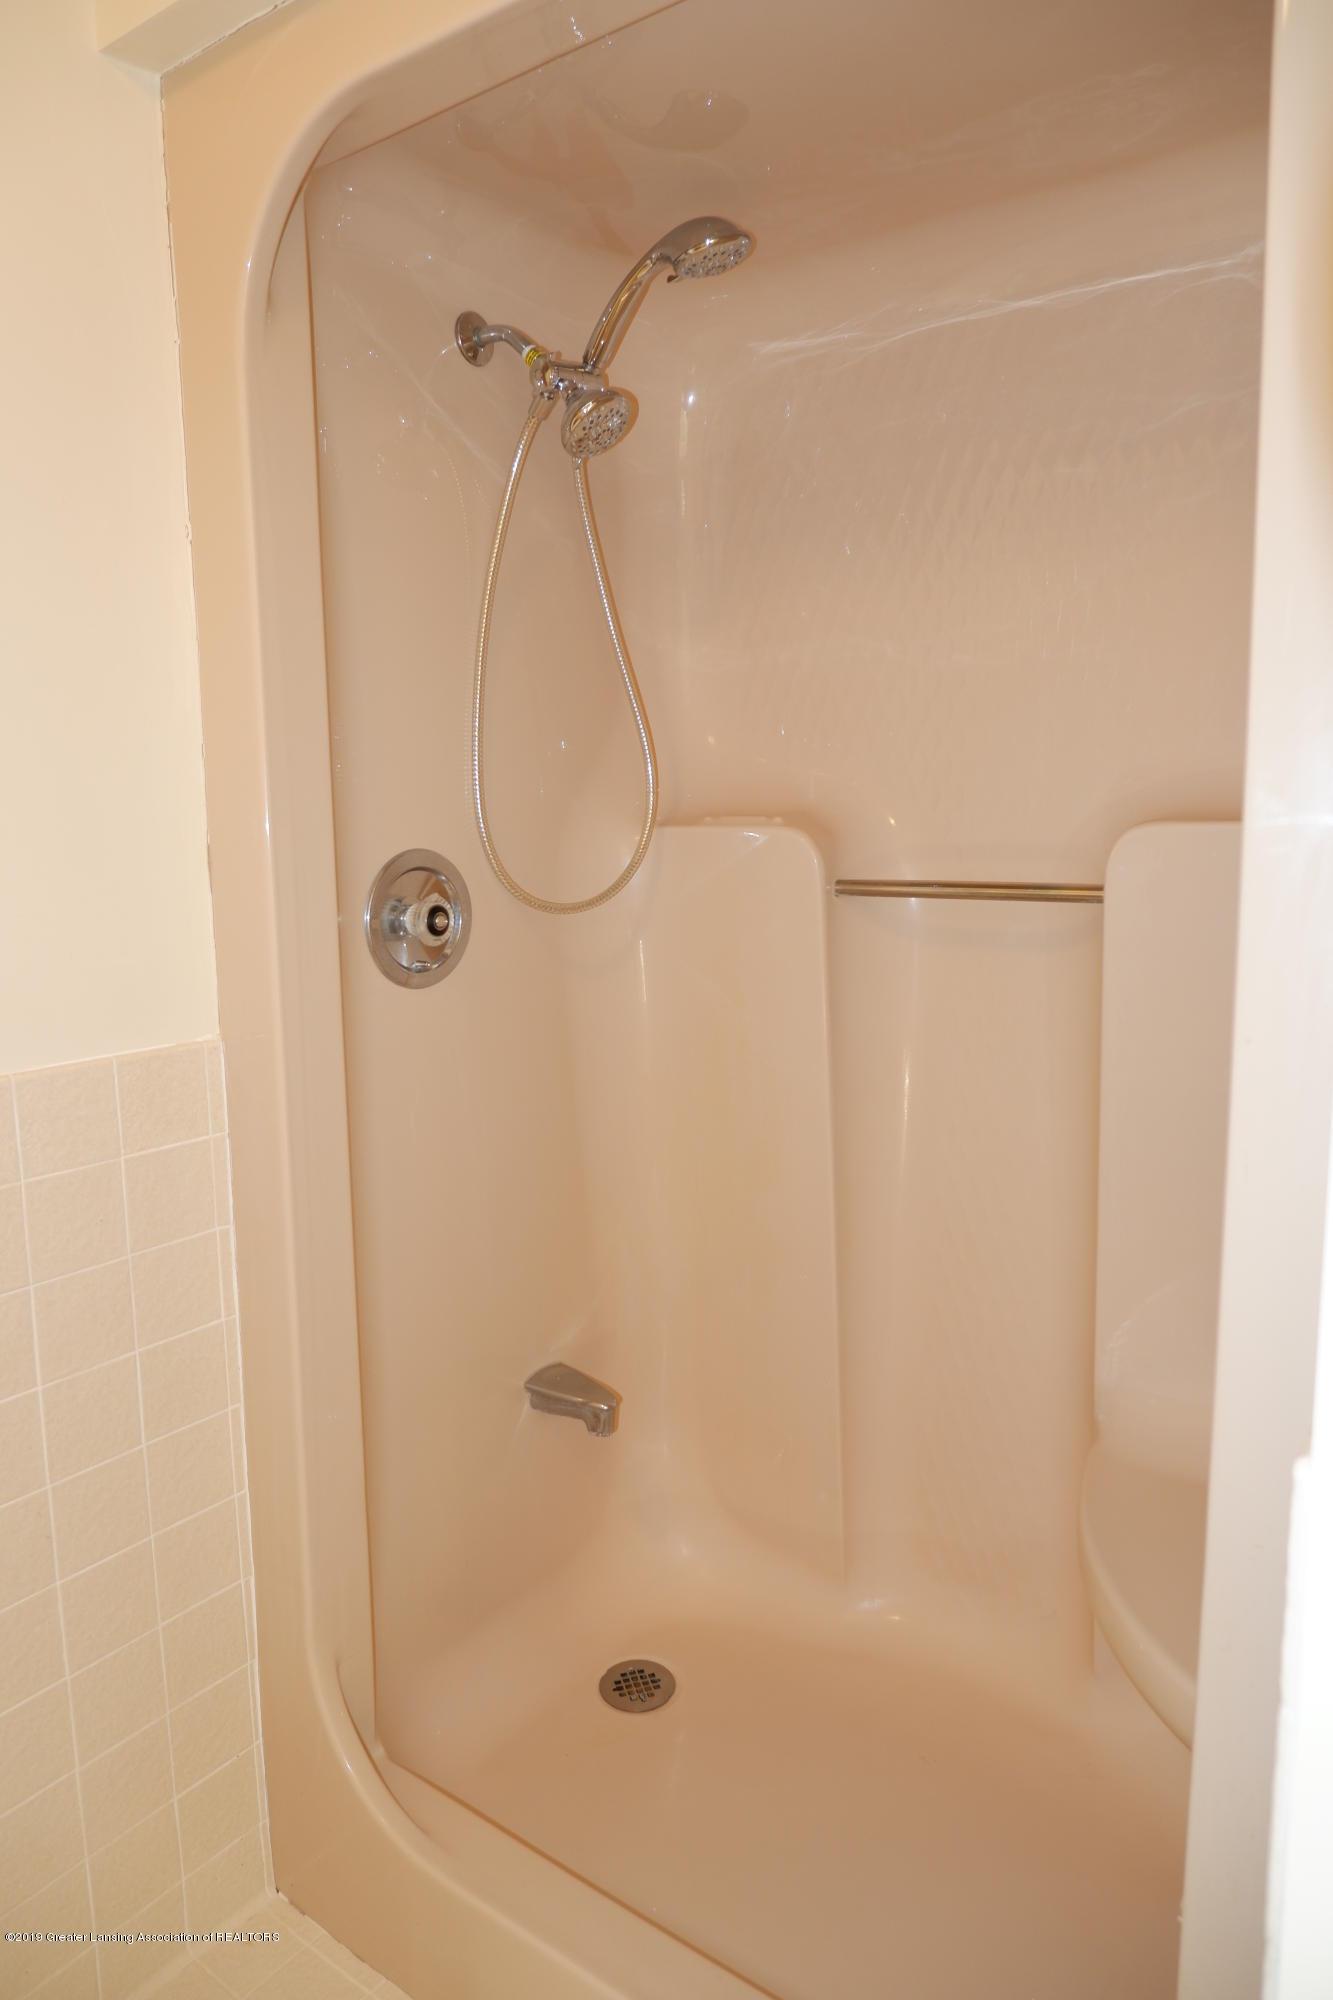 8933 W Scenic Lake Dr - Shower in master bathroom - 27